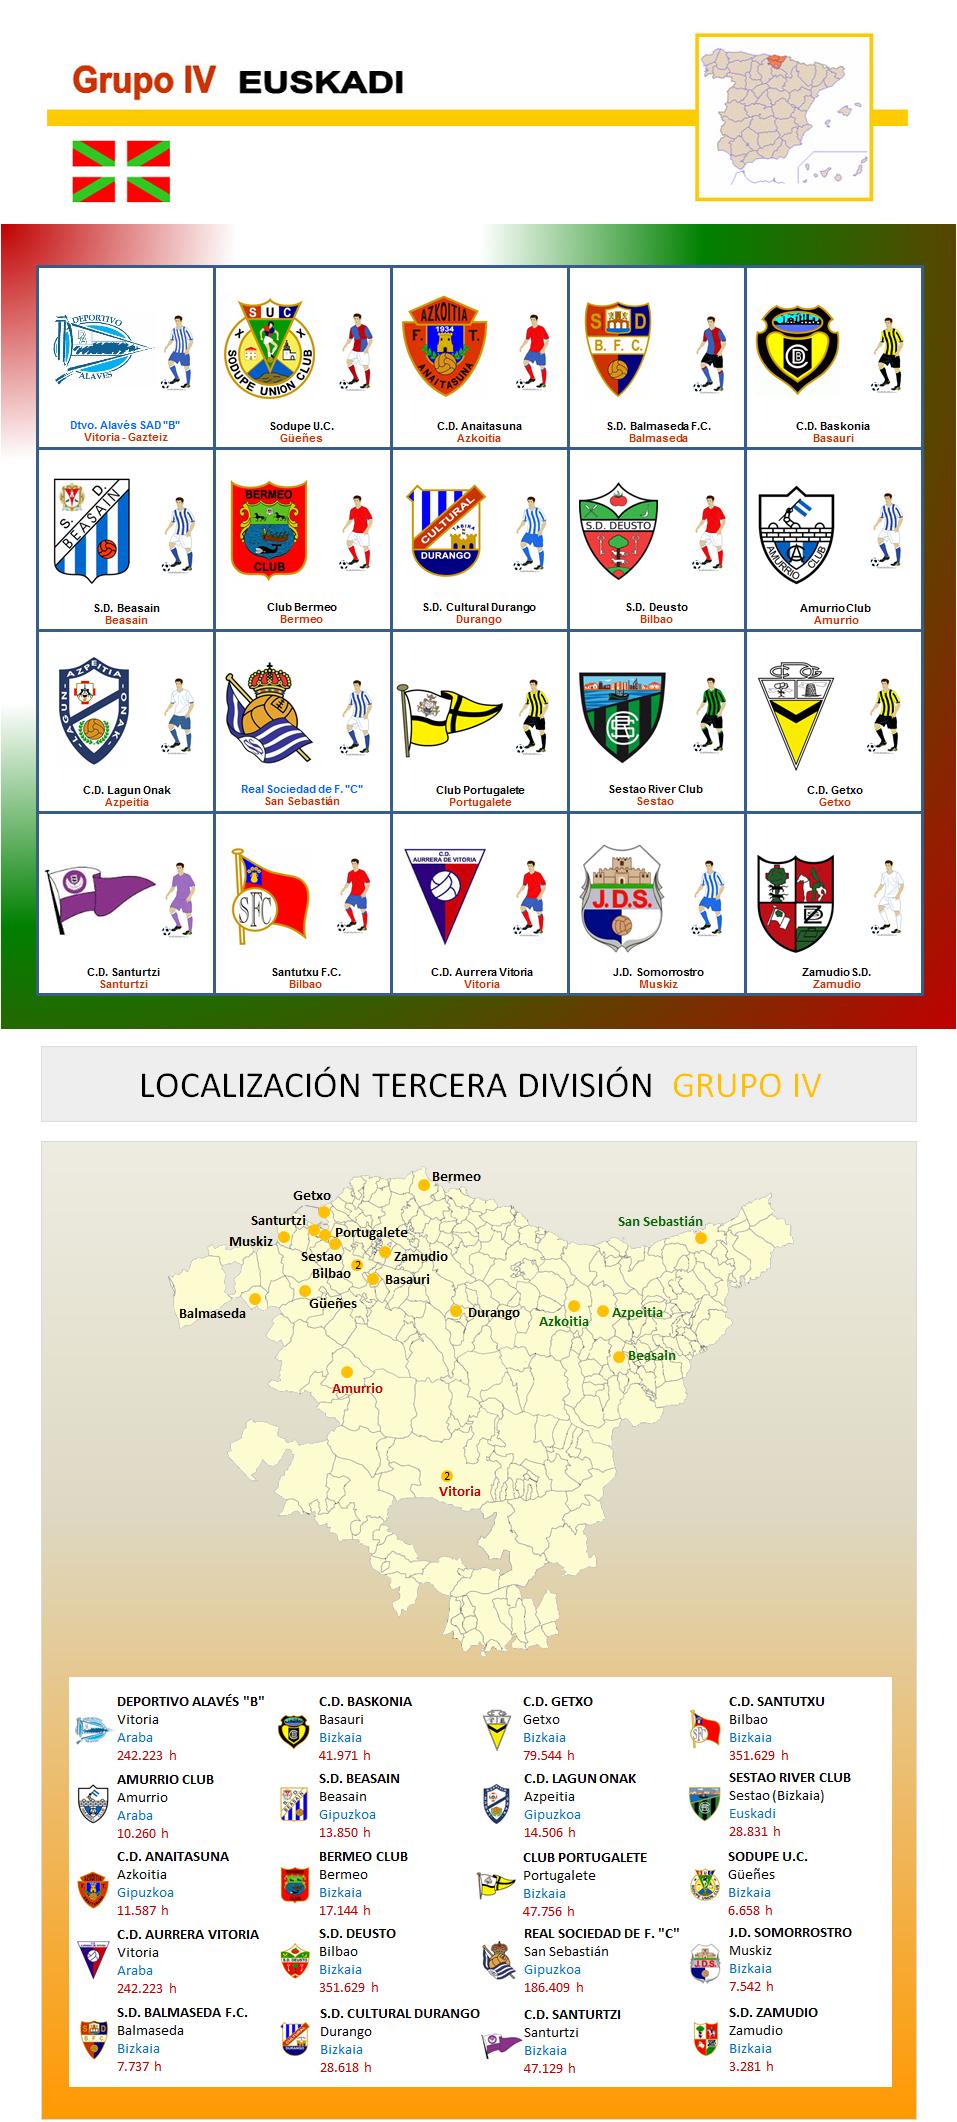 tercera division grupo 4 euskadi | Hiszpania | Pinterest